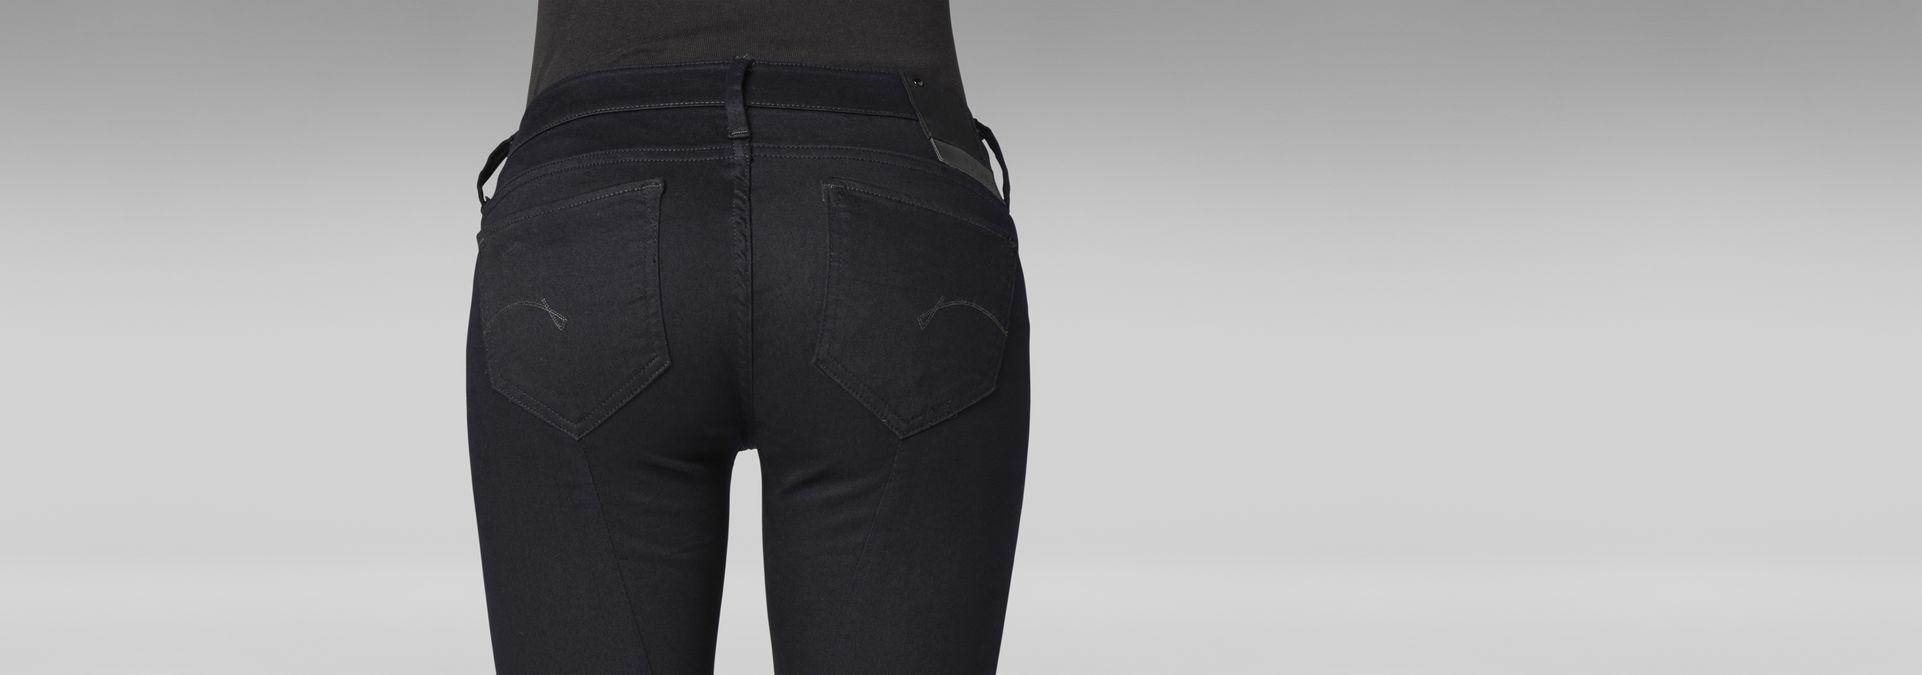 midge sculpted skinny jeans raw denim g star raw. Black Bedroom Furniture Sets. Home Design Ideas